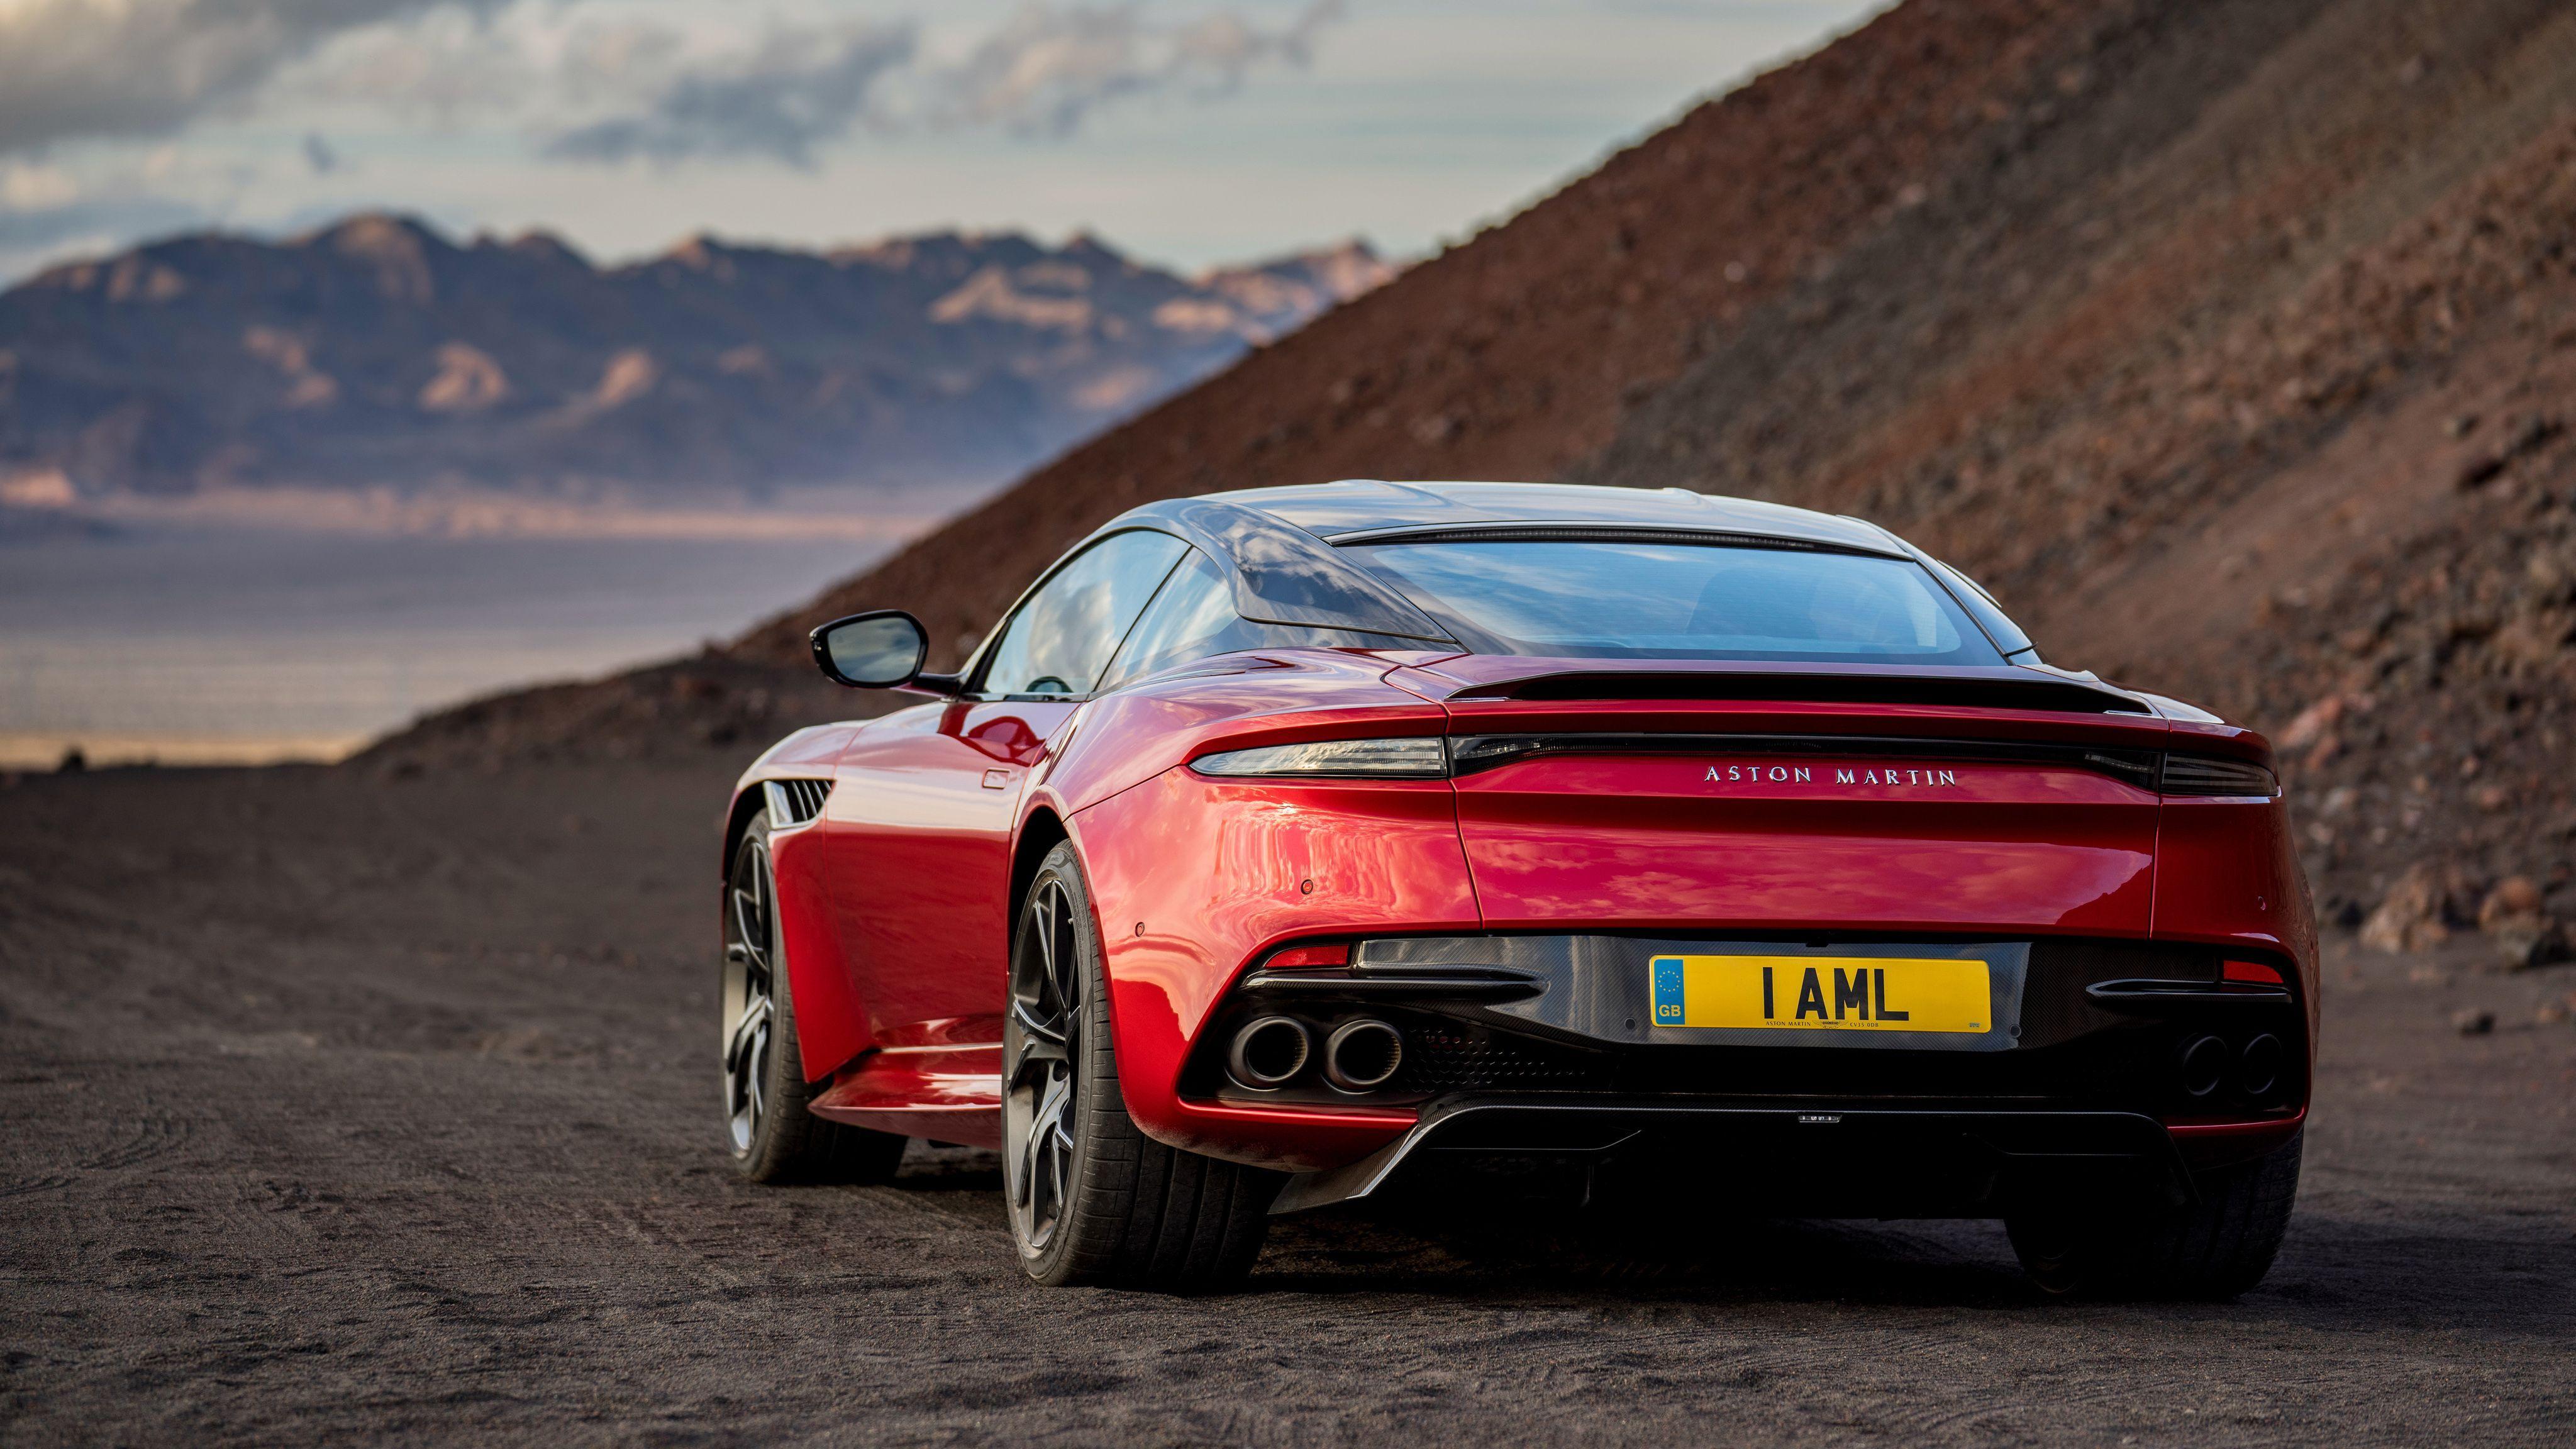 Aston Martin Dbs Wallpapers Top Free Aston Martin Dbs Backgrounds Wallpaperaccess